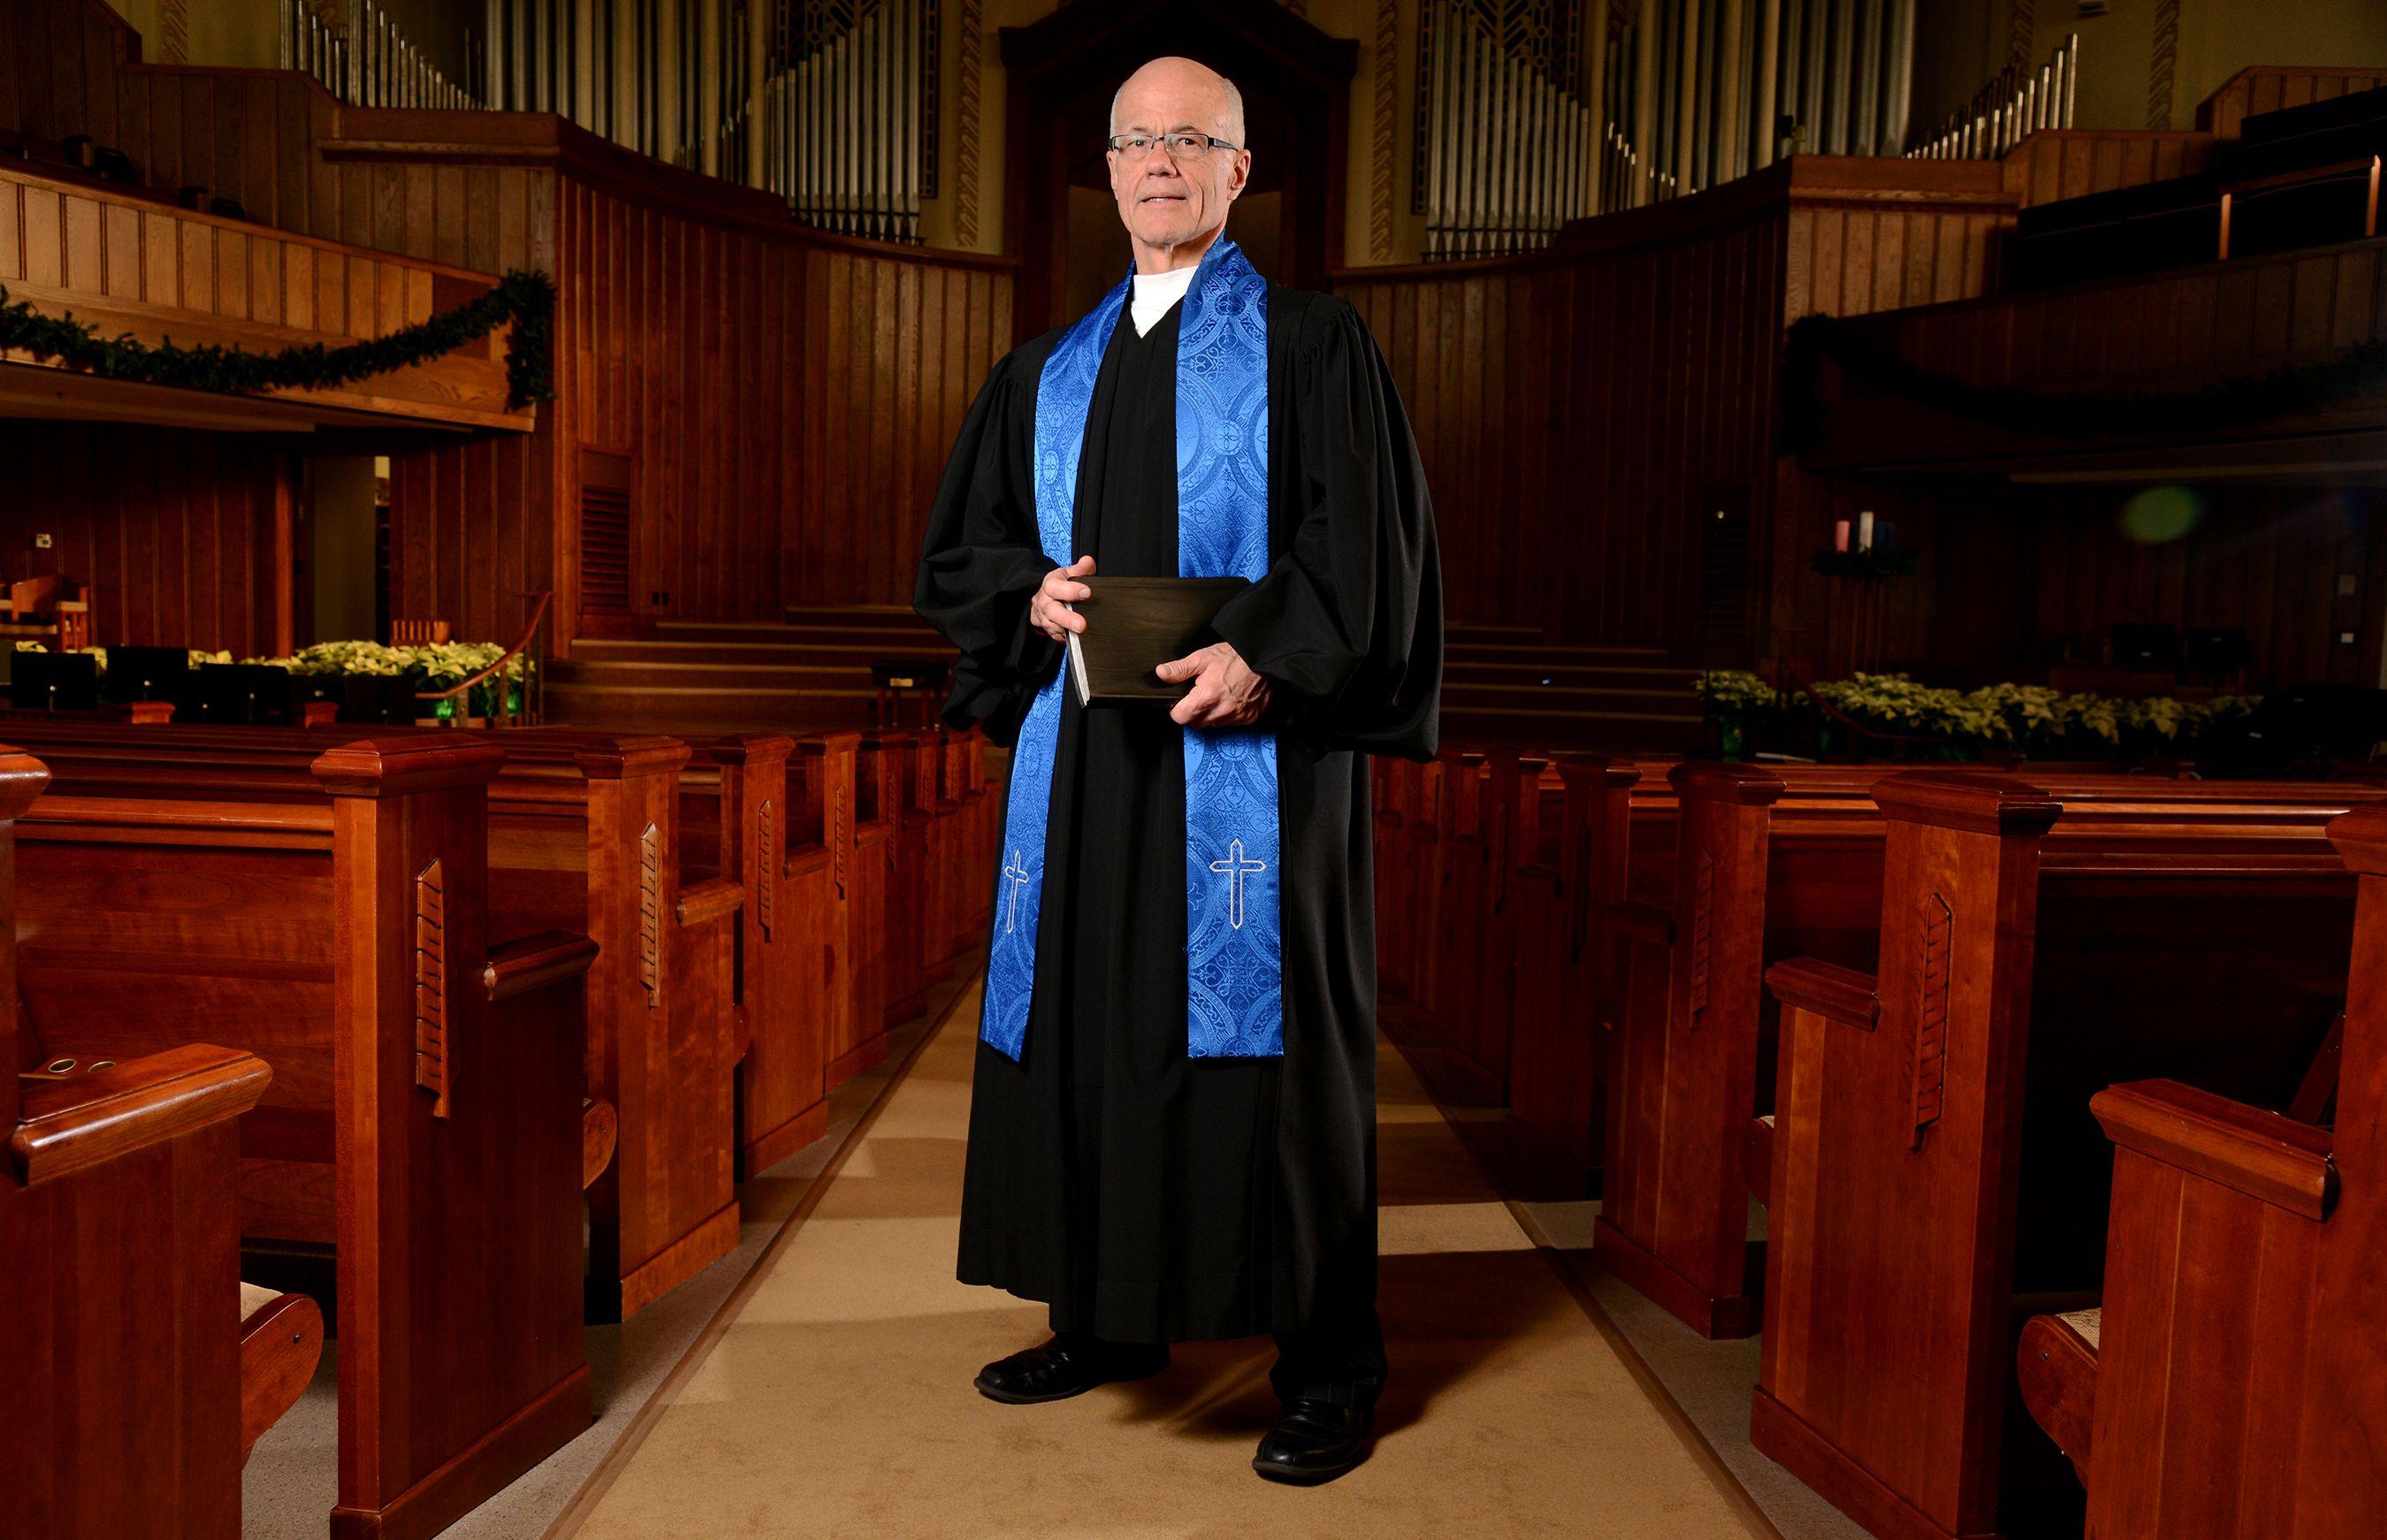 Pastor Dr. Guy Sayles